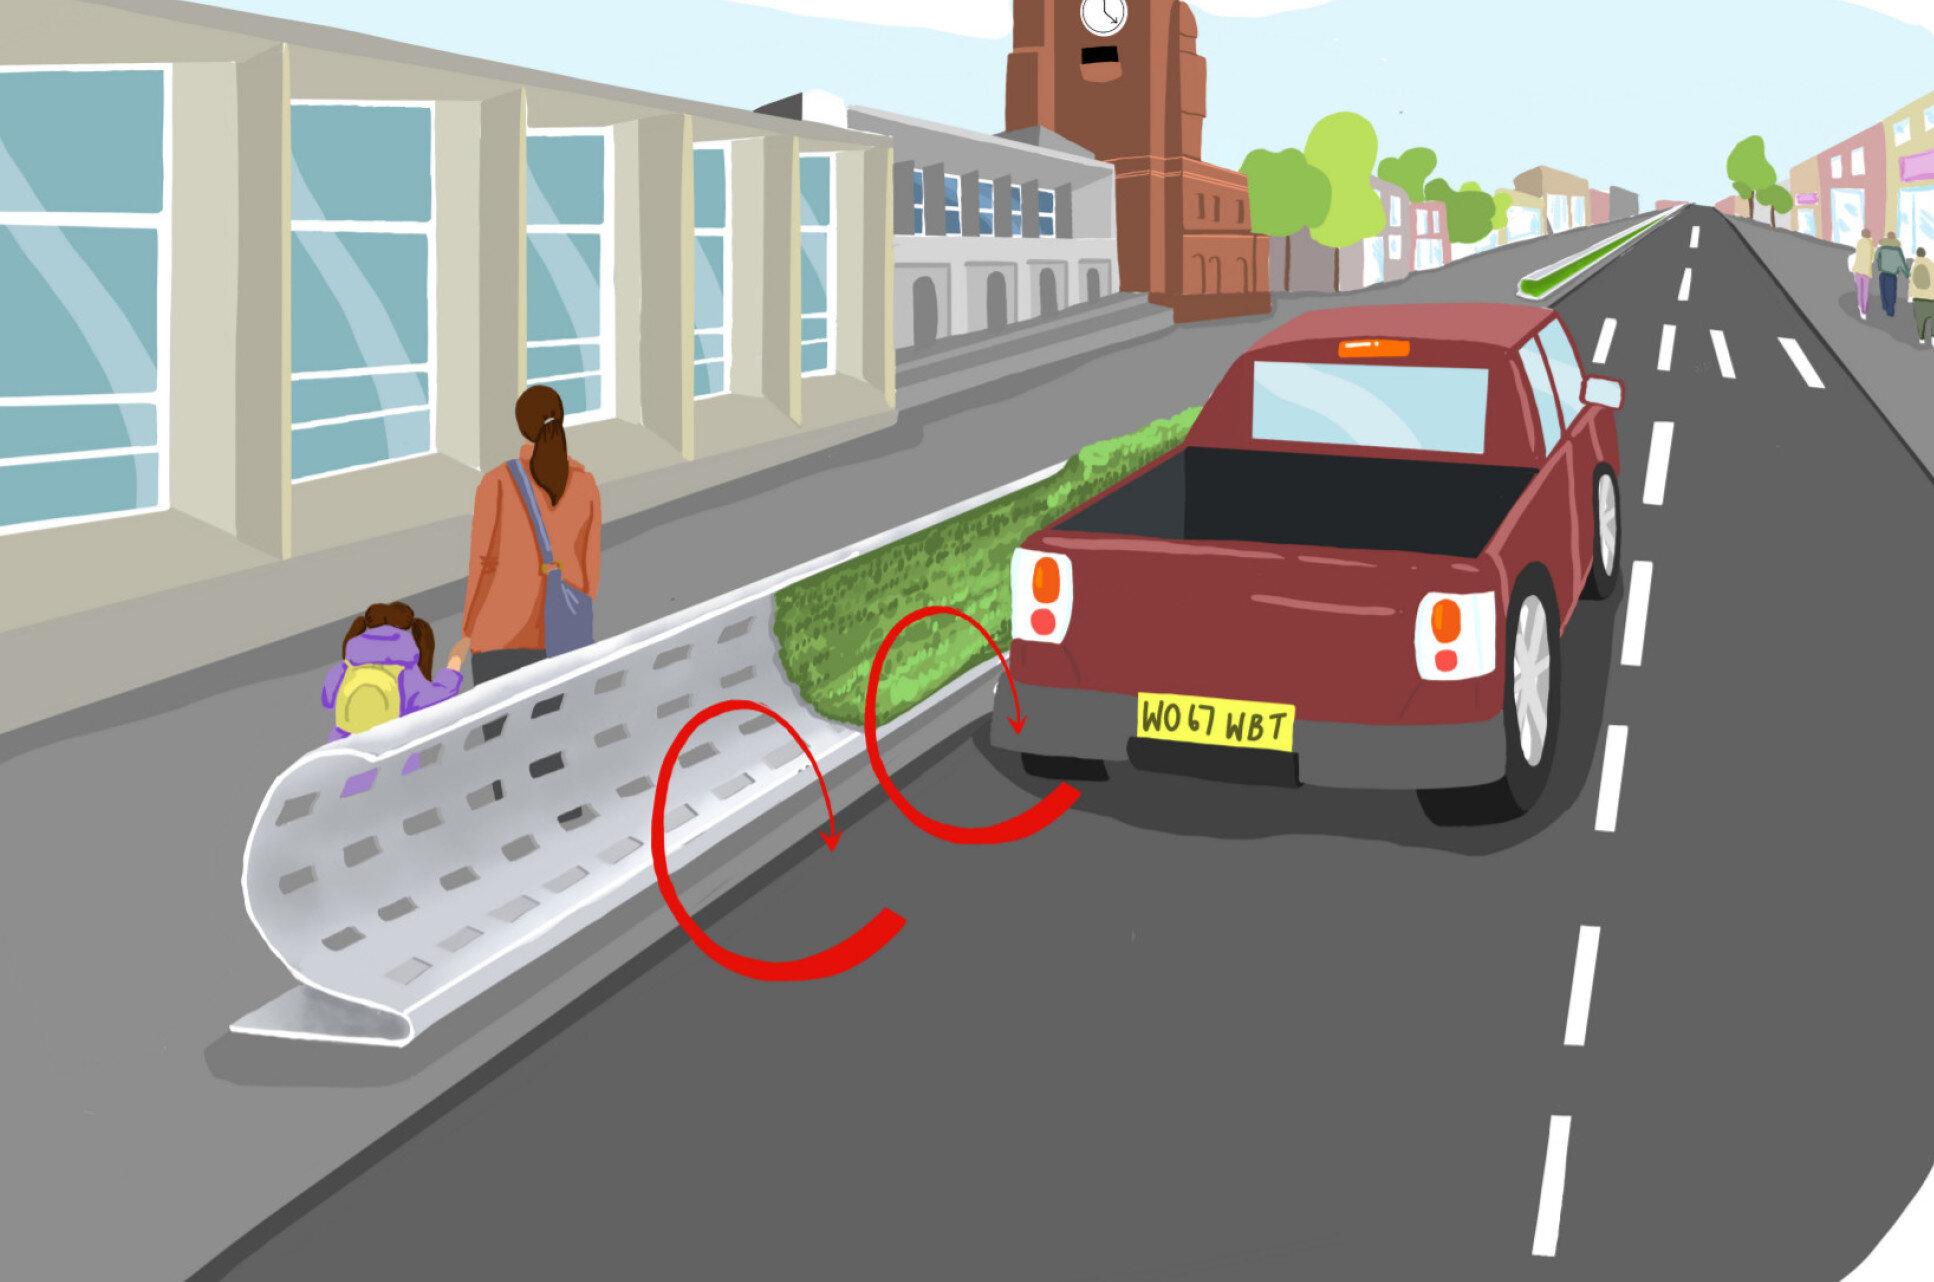 Researchers develop roadside barrier design to mitigate air pollution